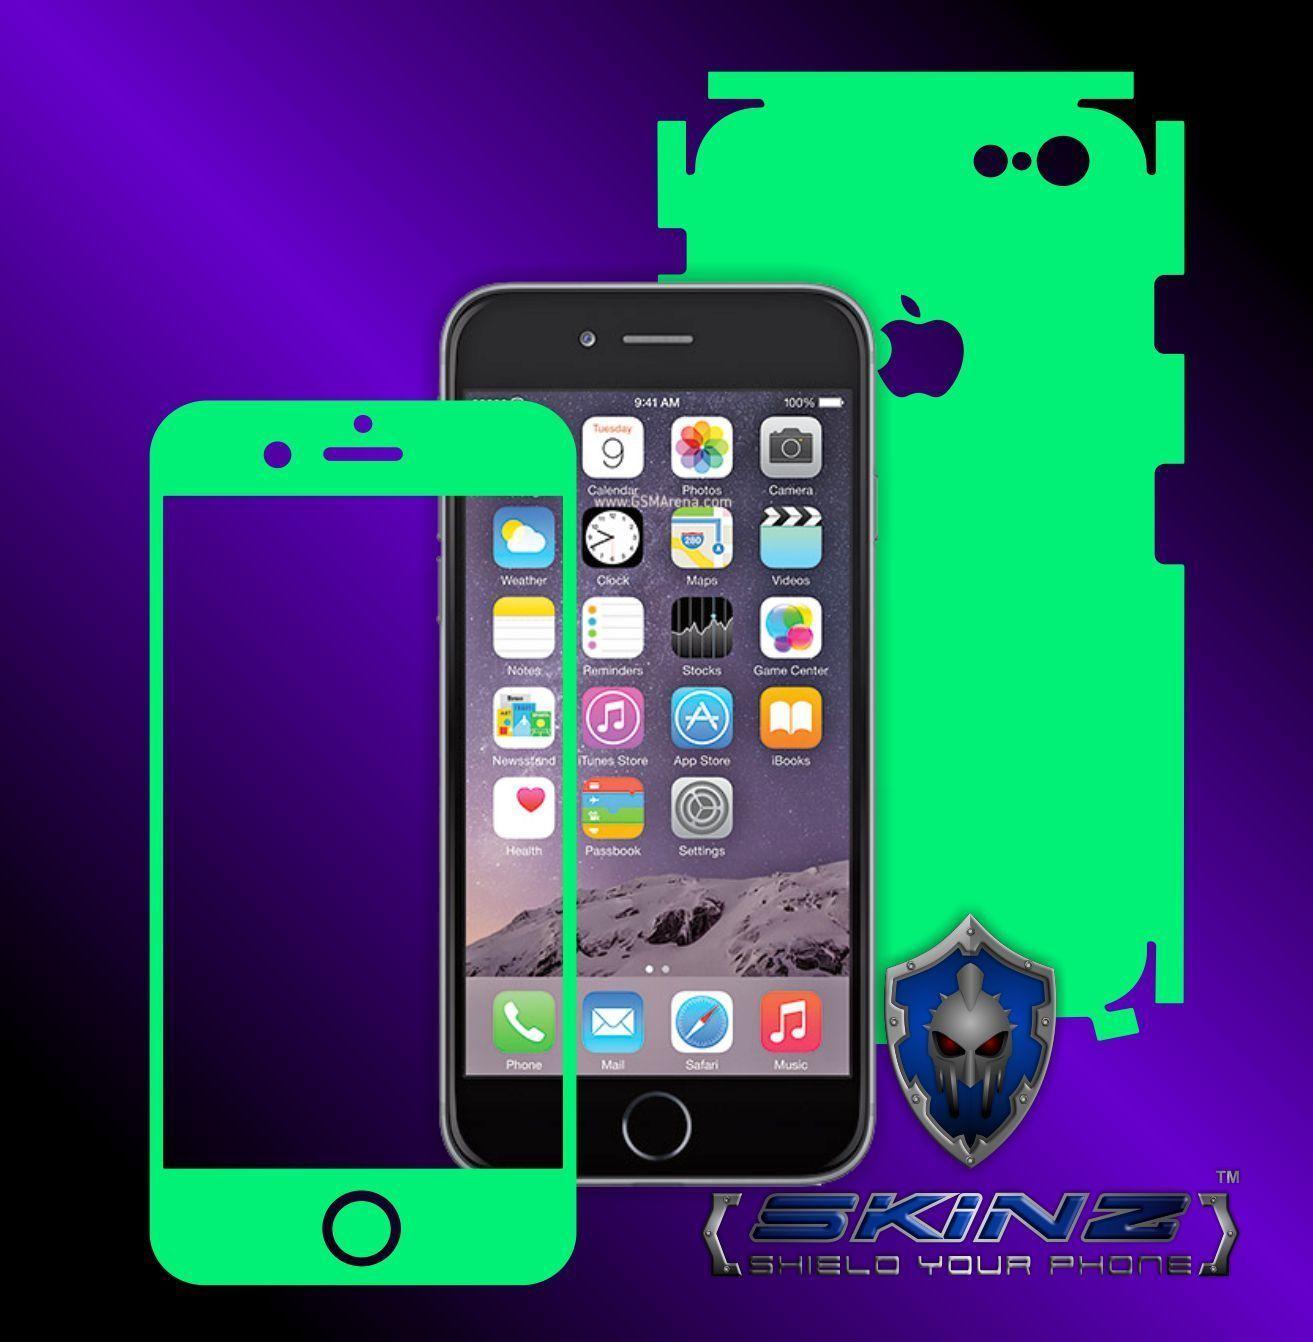 "iPhone 6 / 6S Plus 5.5"" - Glow in the Dark Skin, Full Body Case Cover Protector"